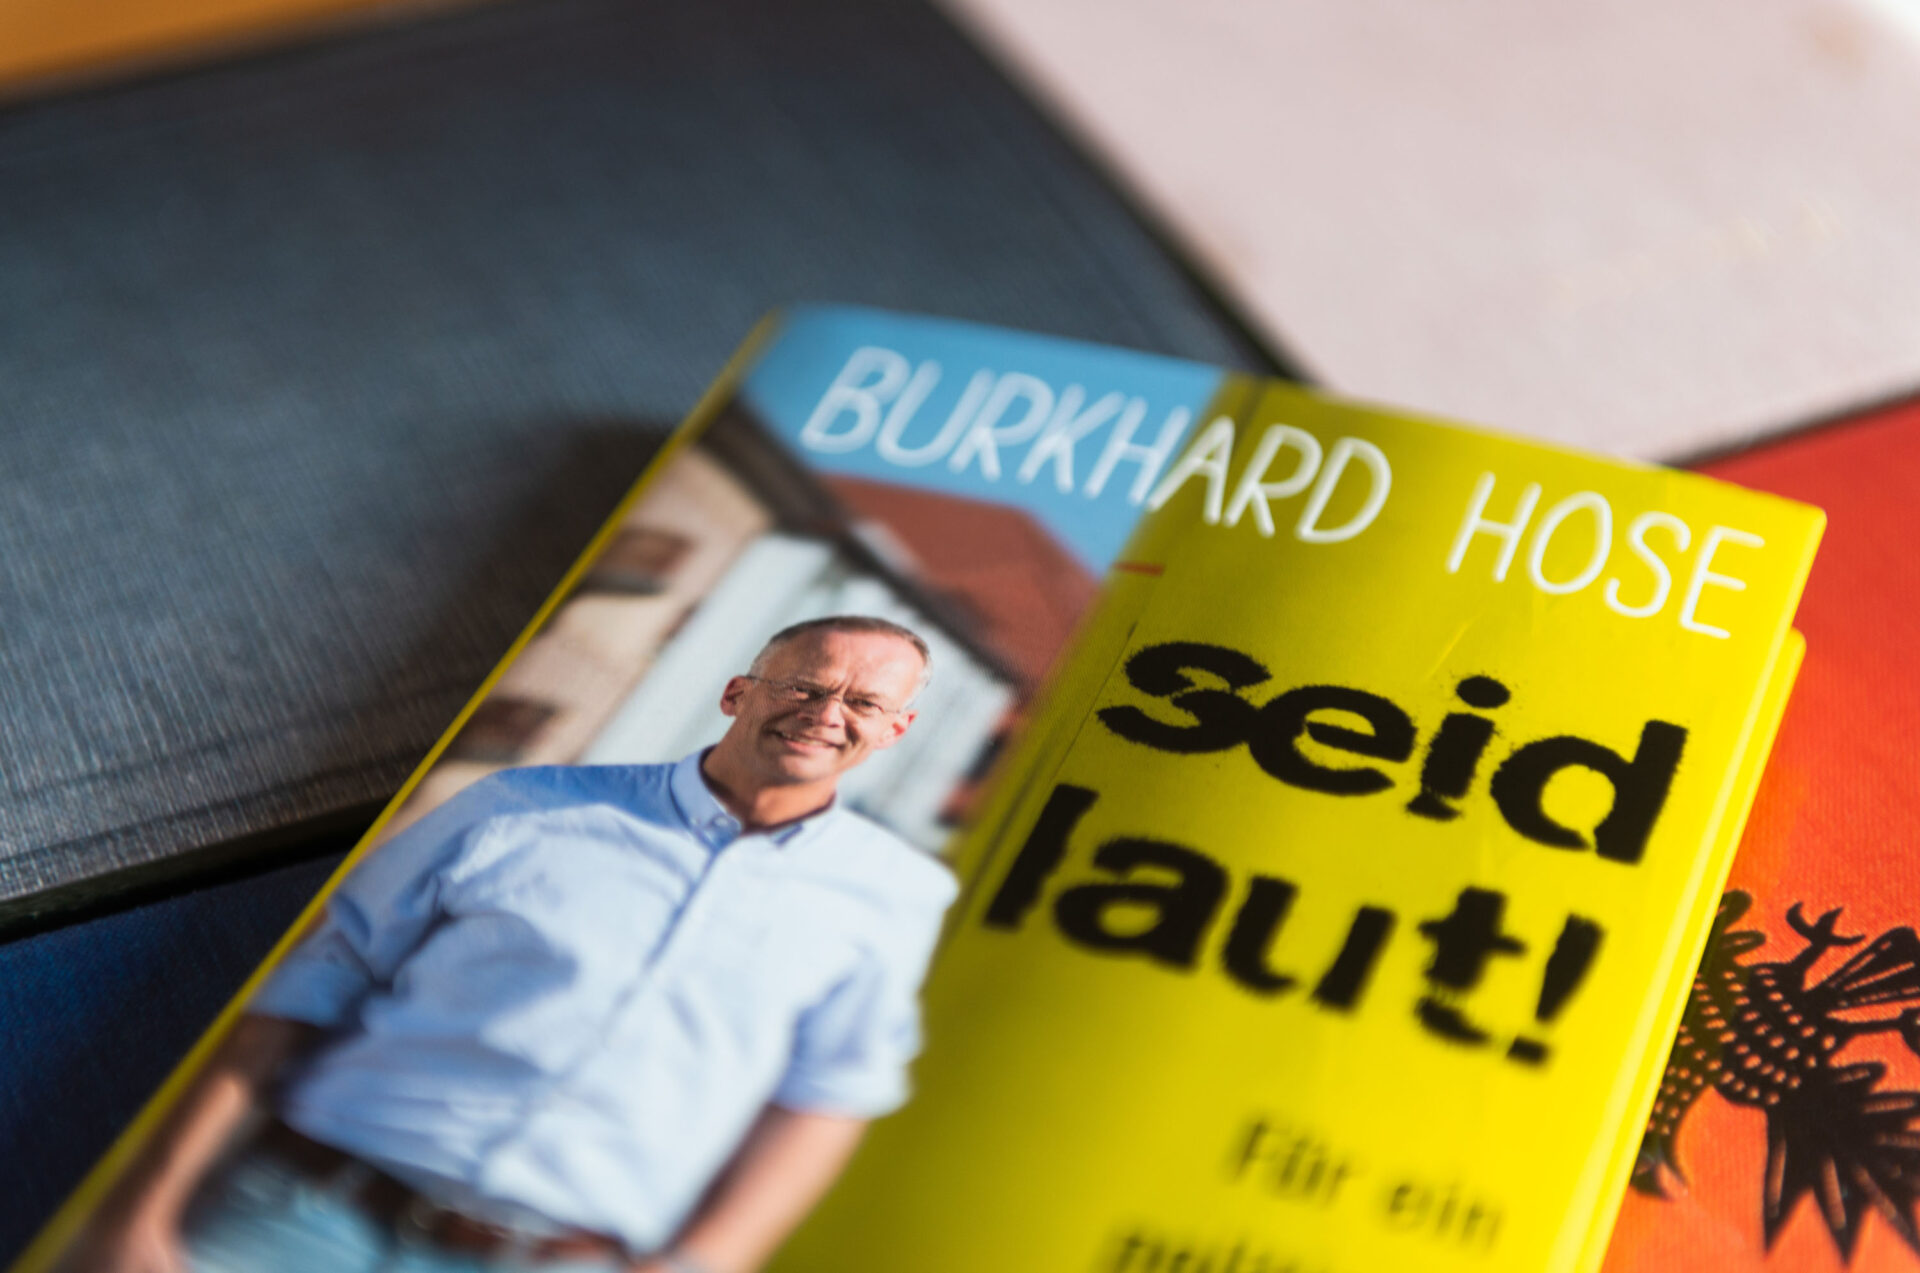 Buch Seid laut Burkhard Hose